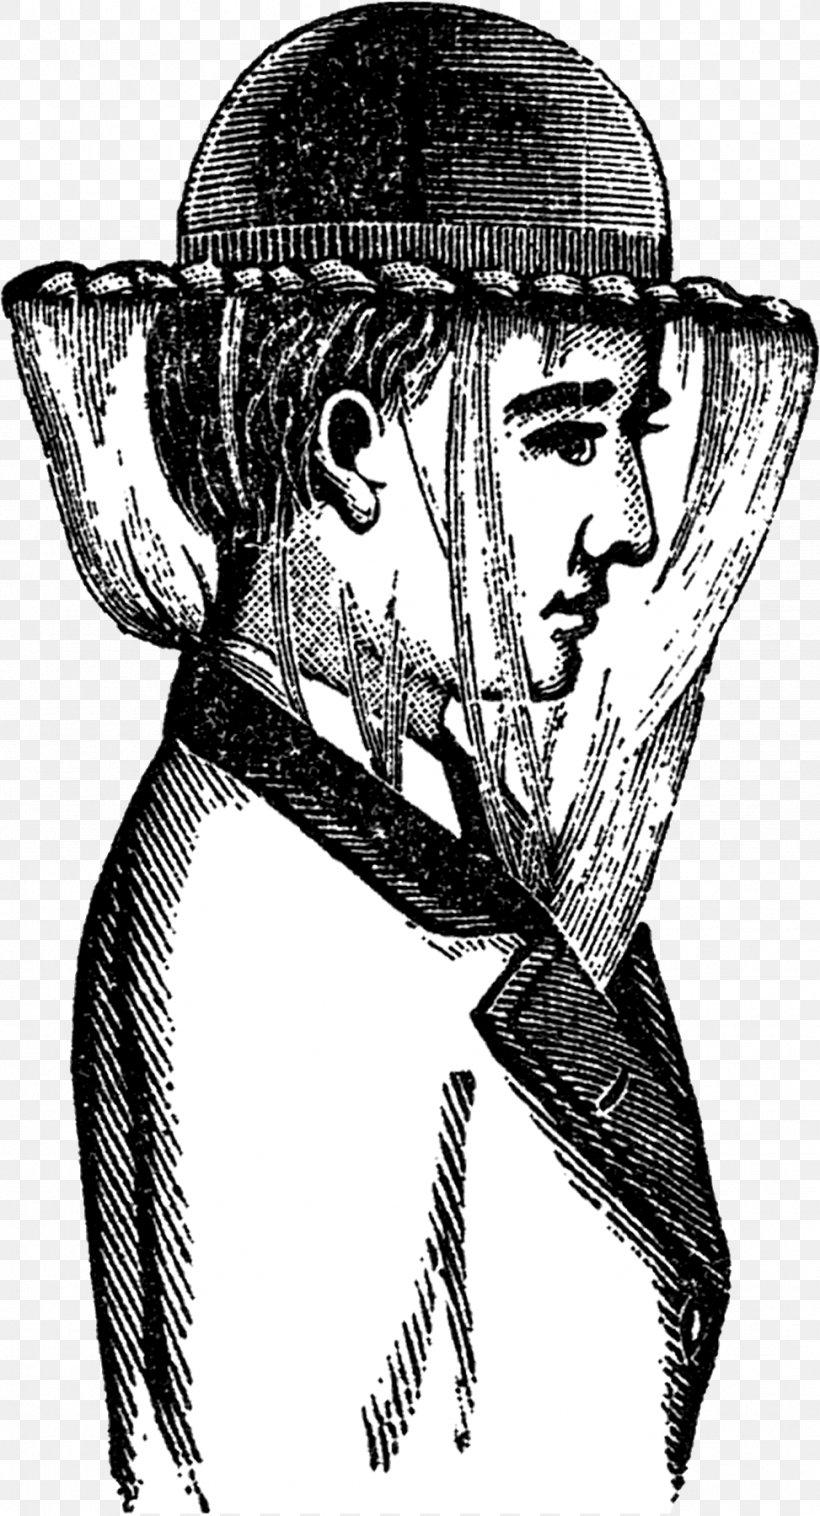 Beekeeper Beekeeping Face Mask Clip Art, PNG, 973x1800px.